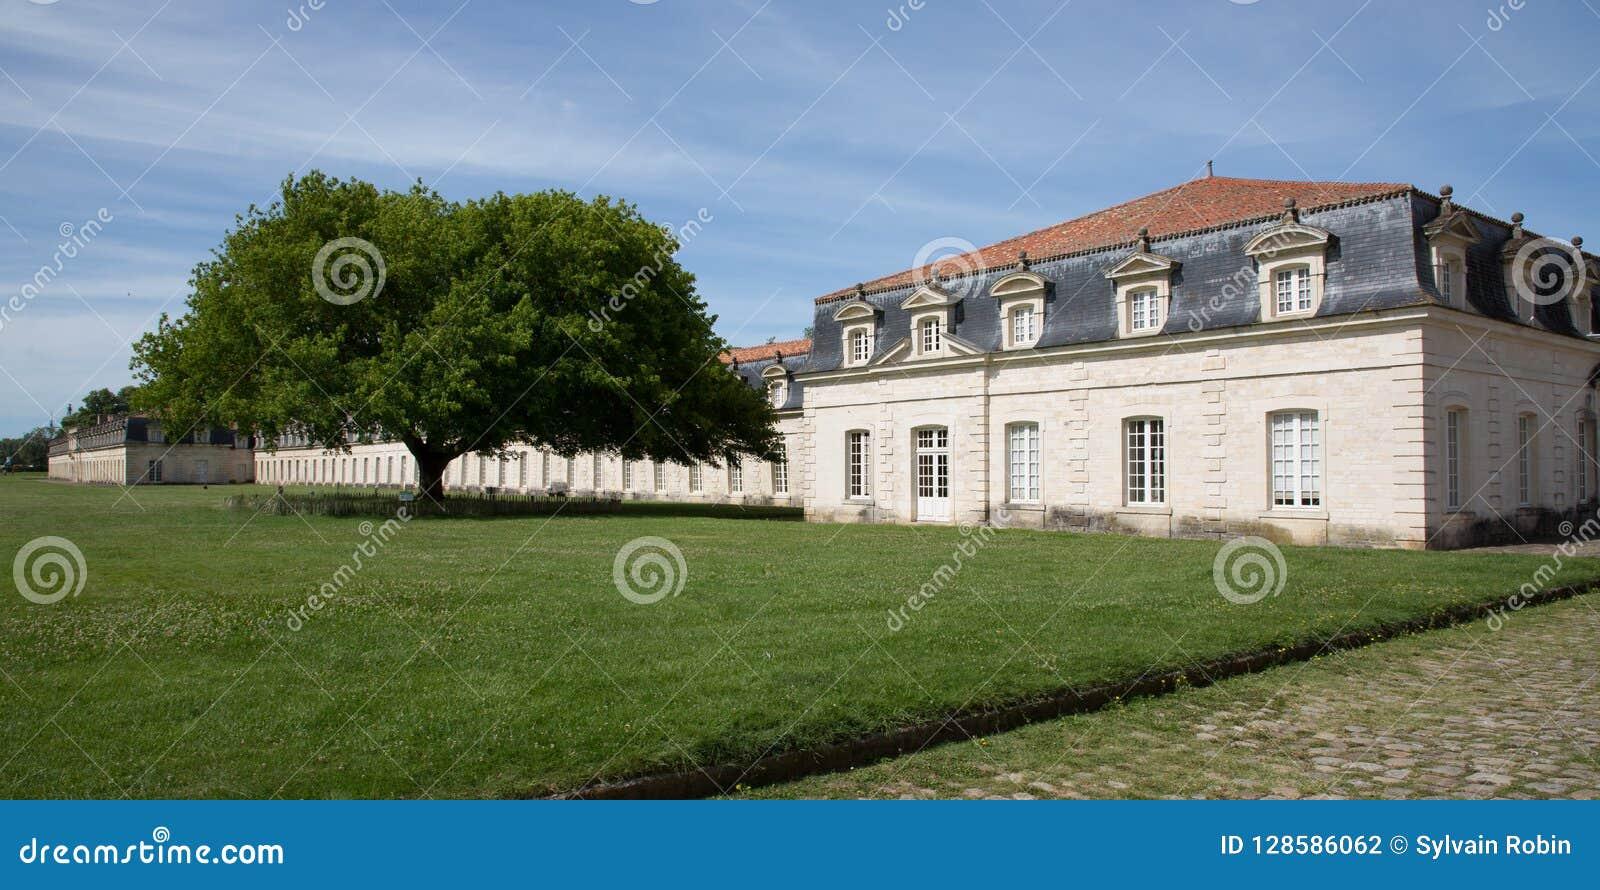 Corderie Royale de Rochefort, Frankrike historia av denna historiska plats